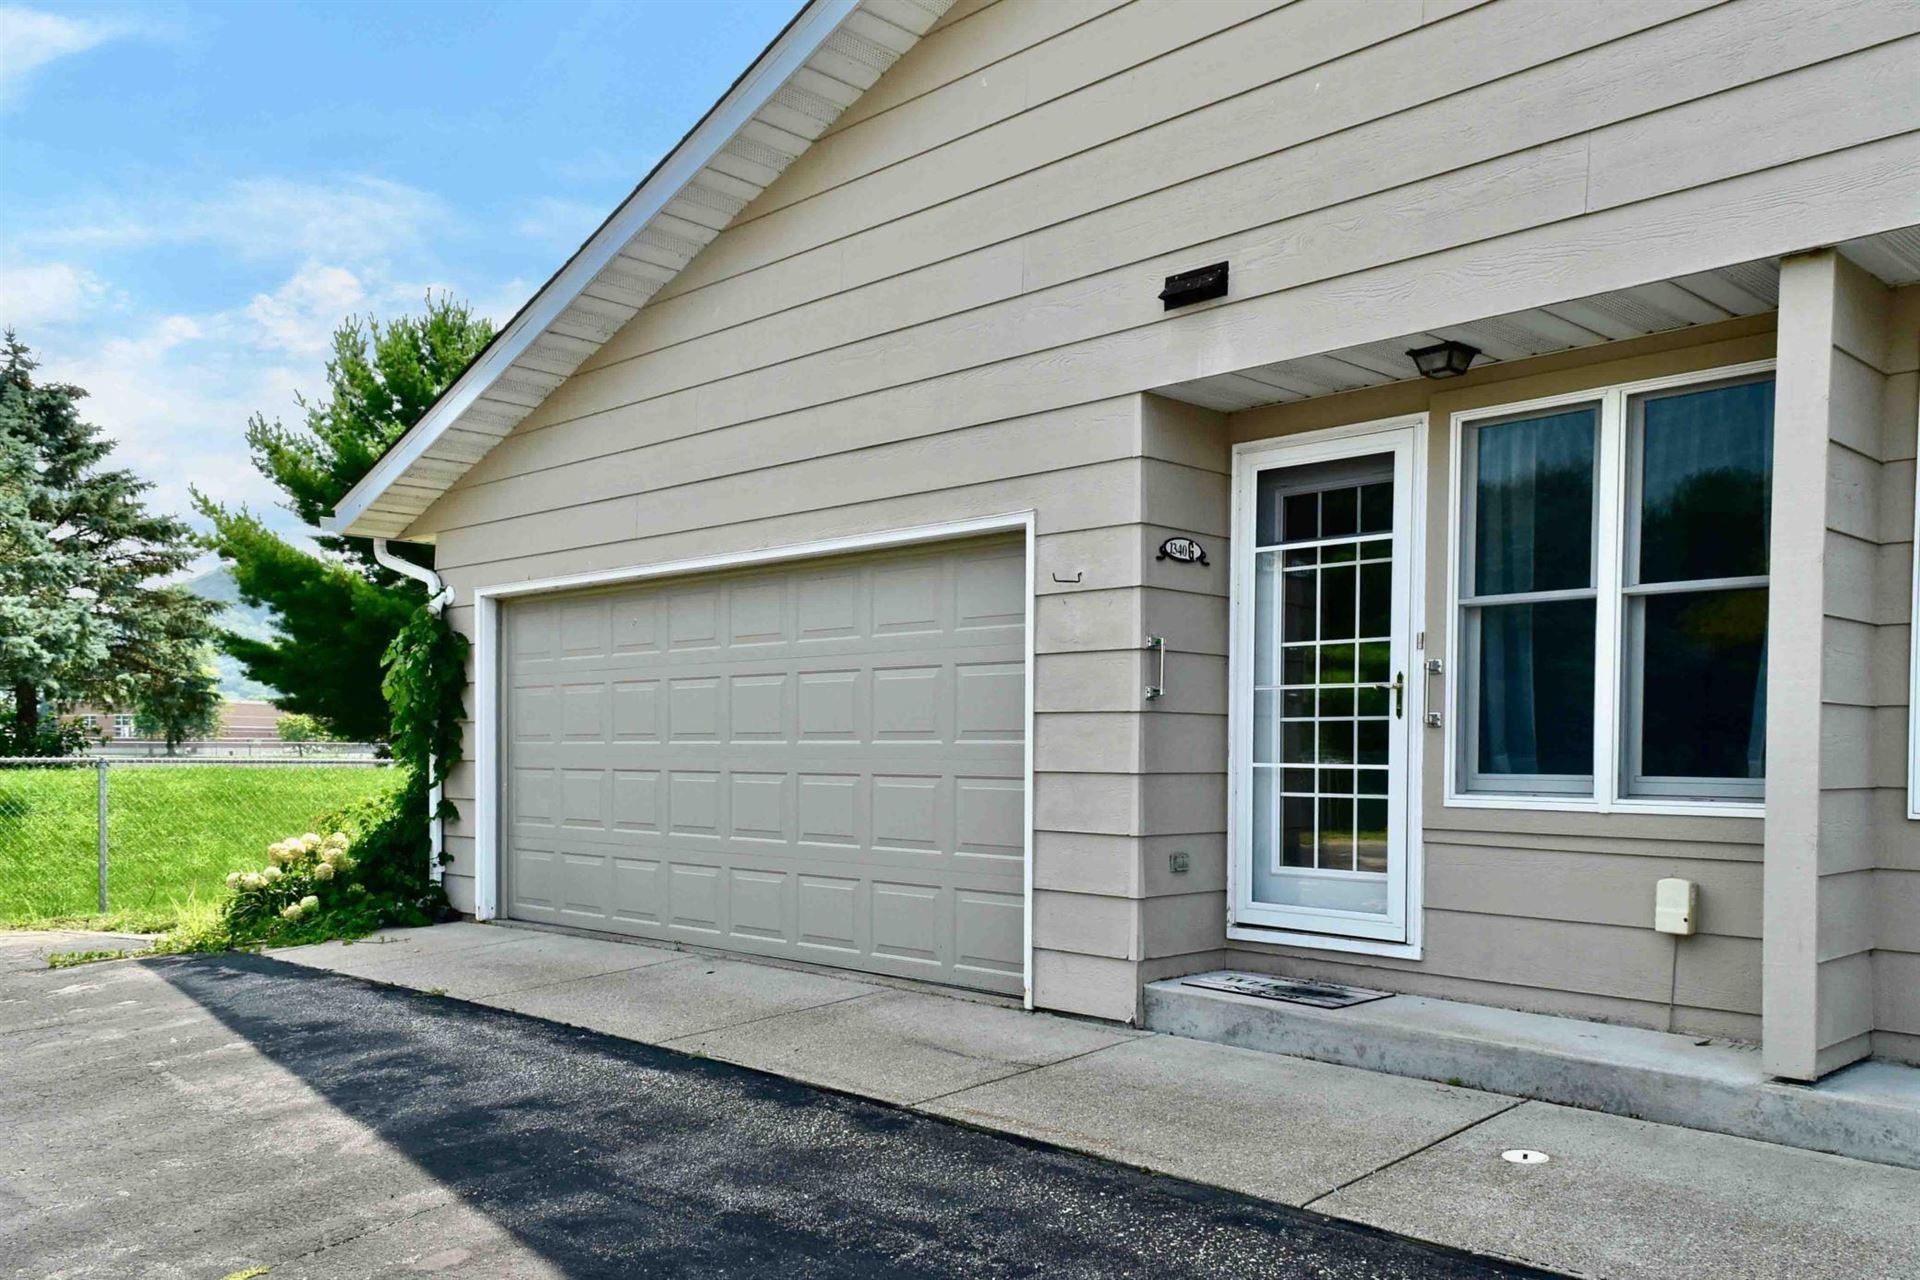 1340 Mcnally Drive #G, Winona, MN 55987 - MLS#: 5751924